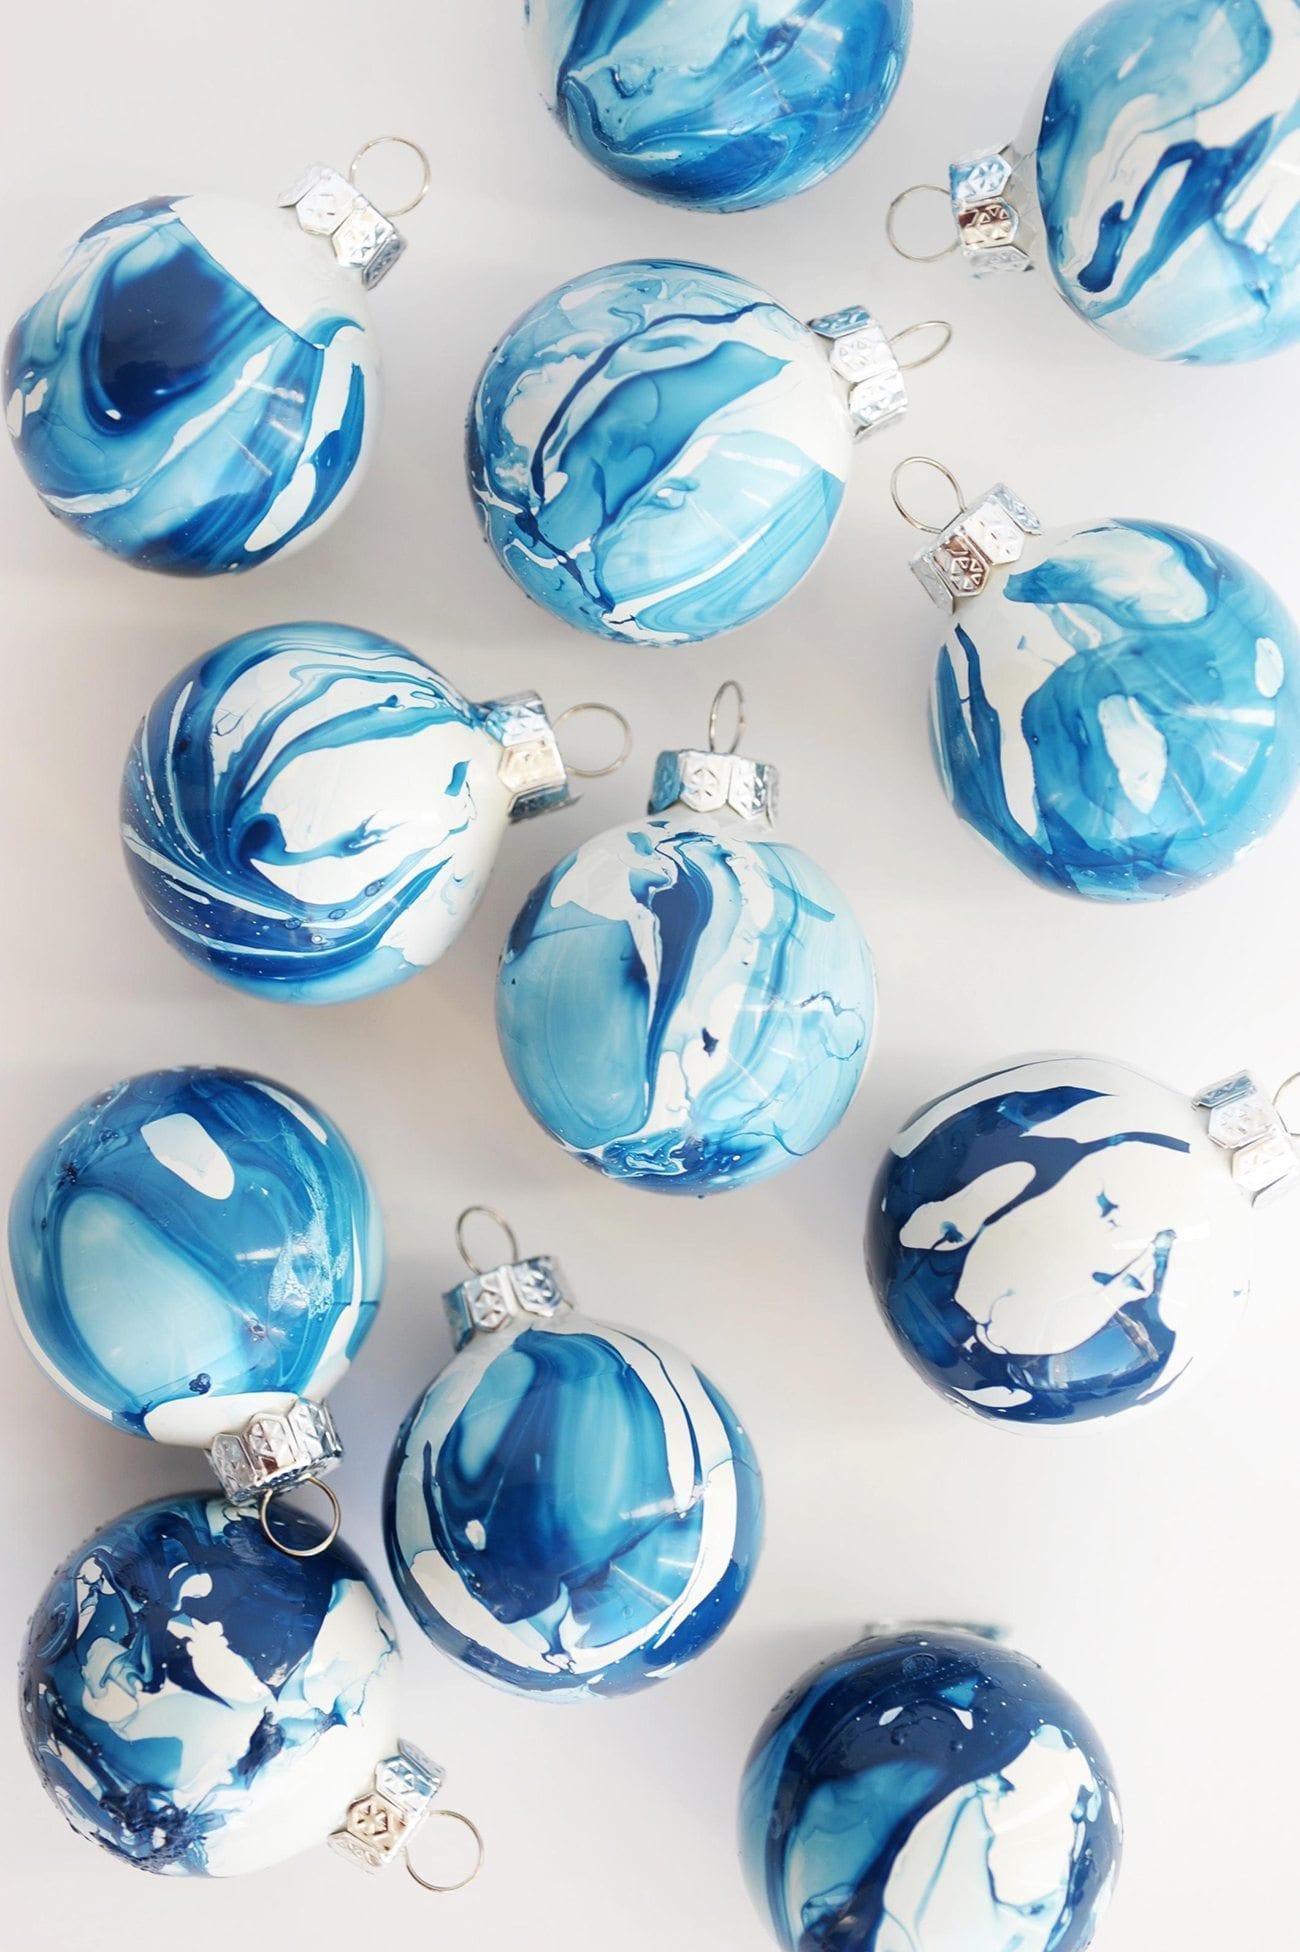 DIY Indigo Marbled Ornaments | Easy glass ornament craft ideas from @cydconverse